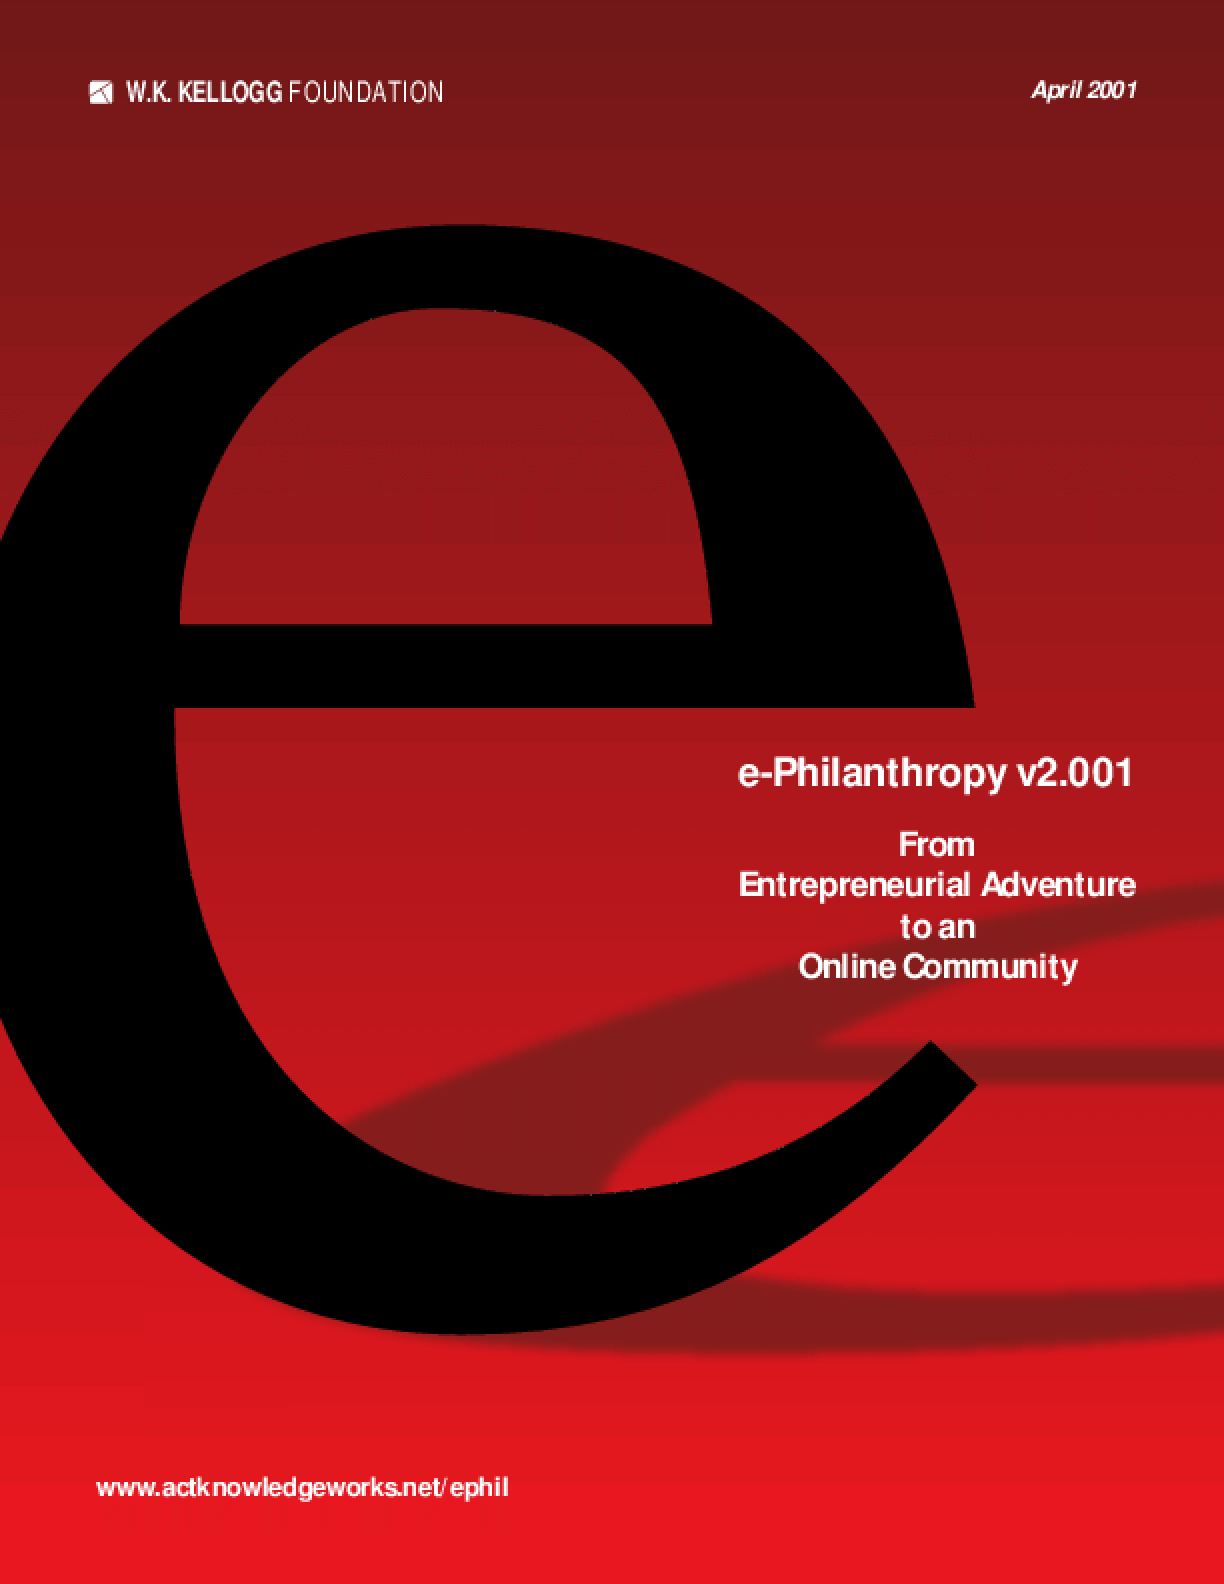 e-Philanthropy v2.001: From Entrepreneurial Adventure to an Online Community